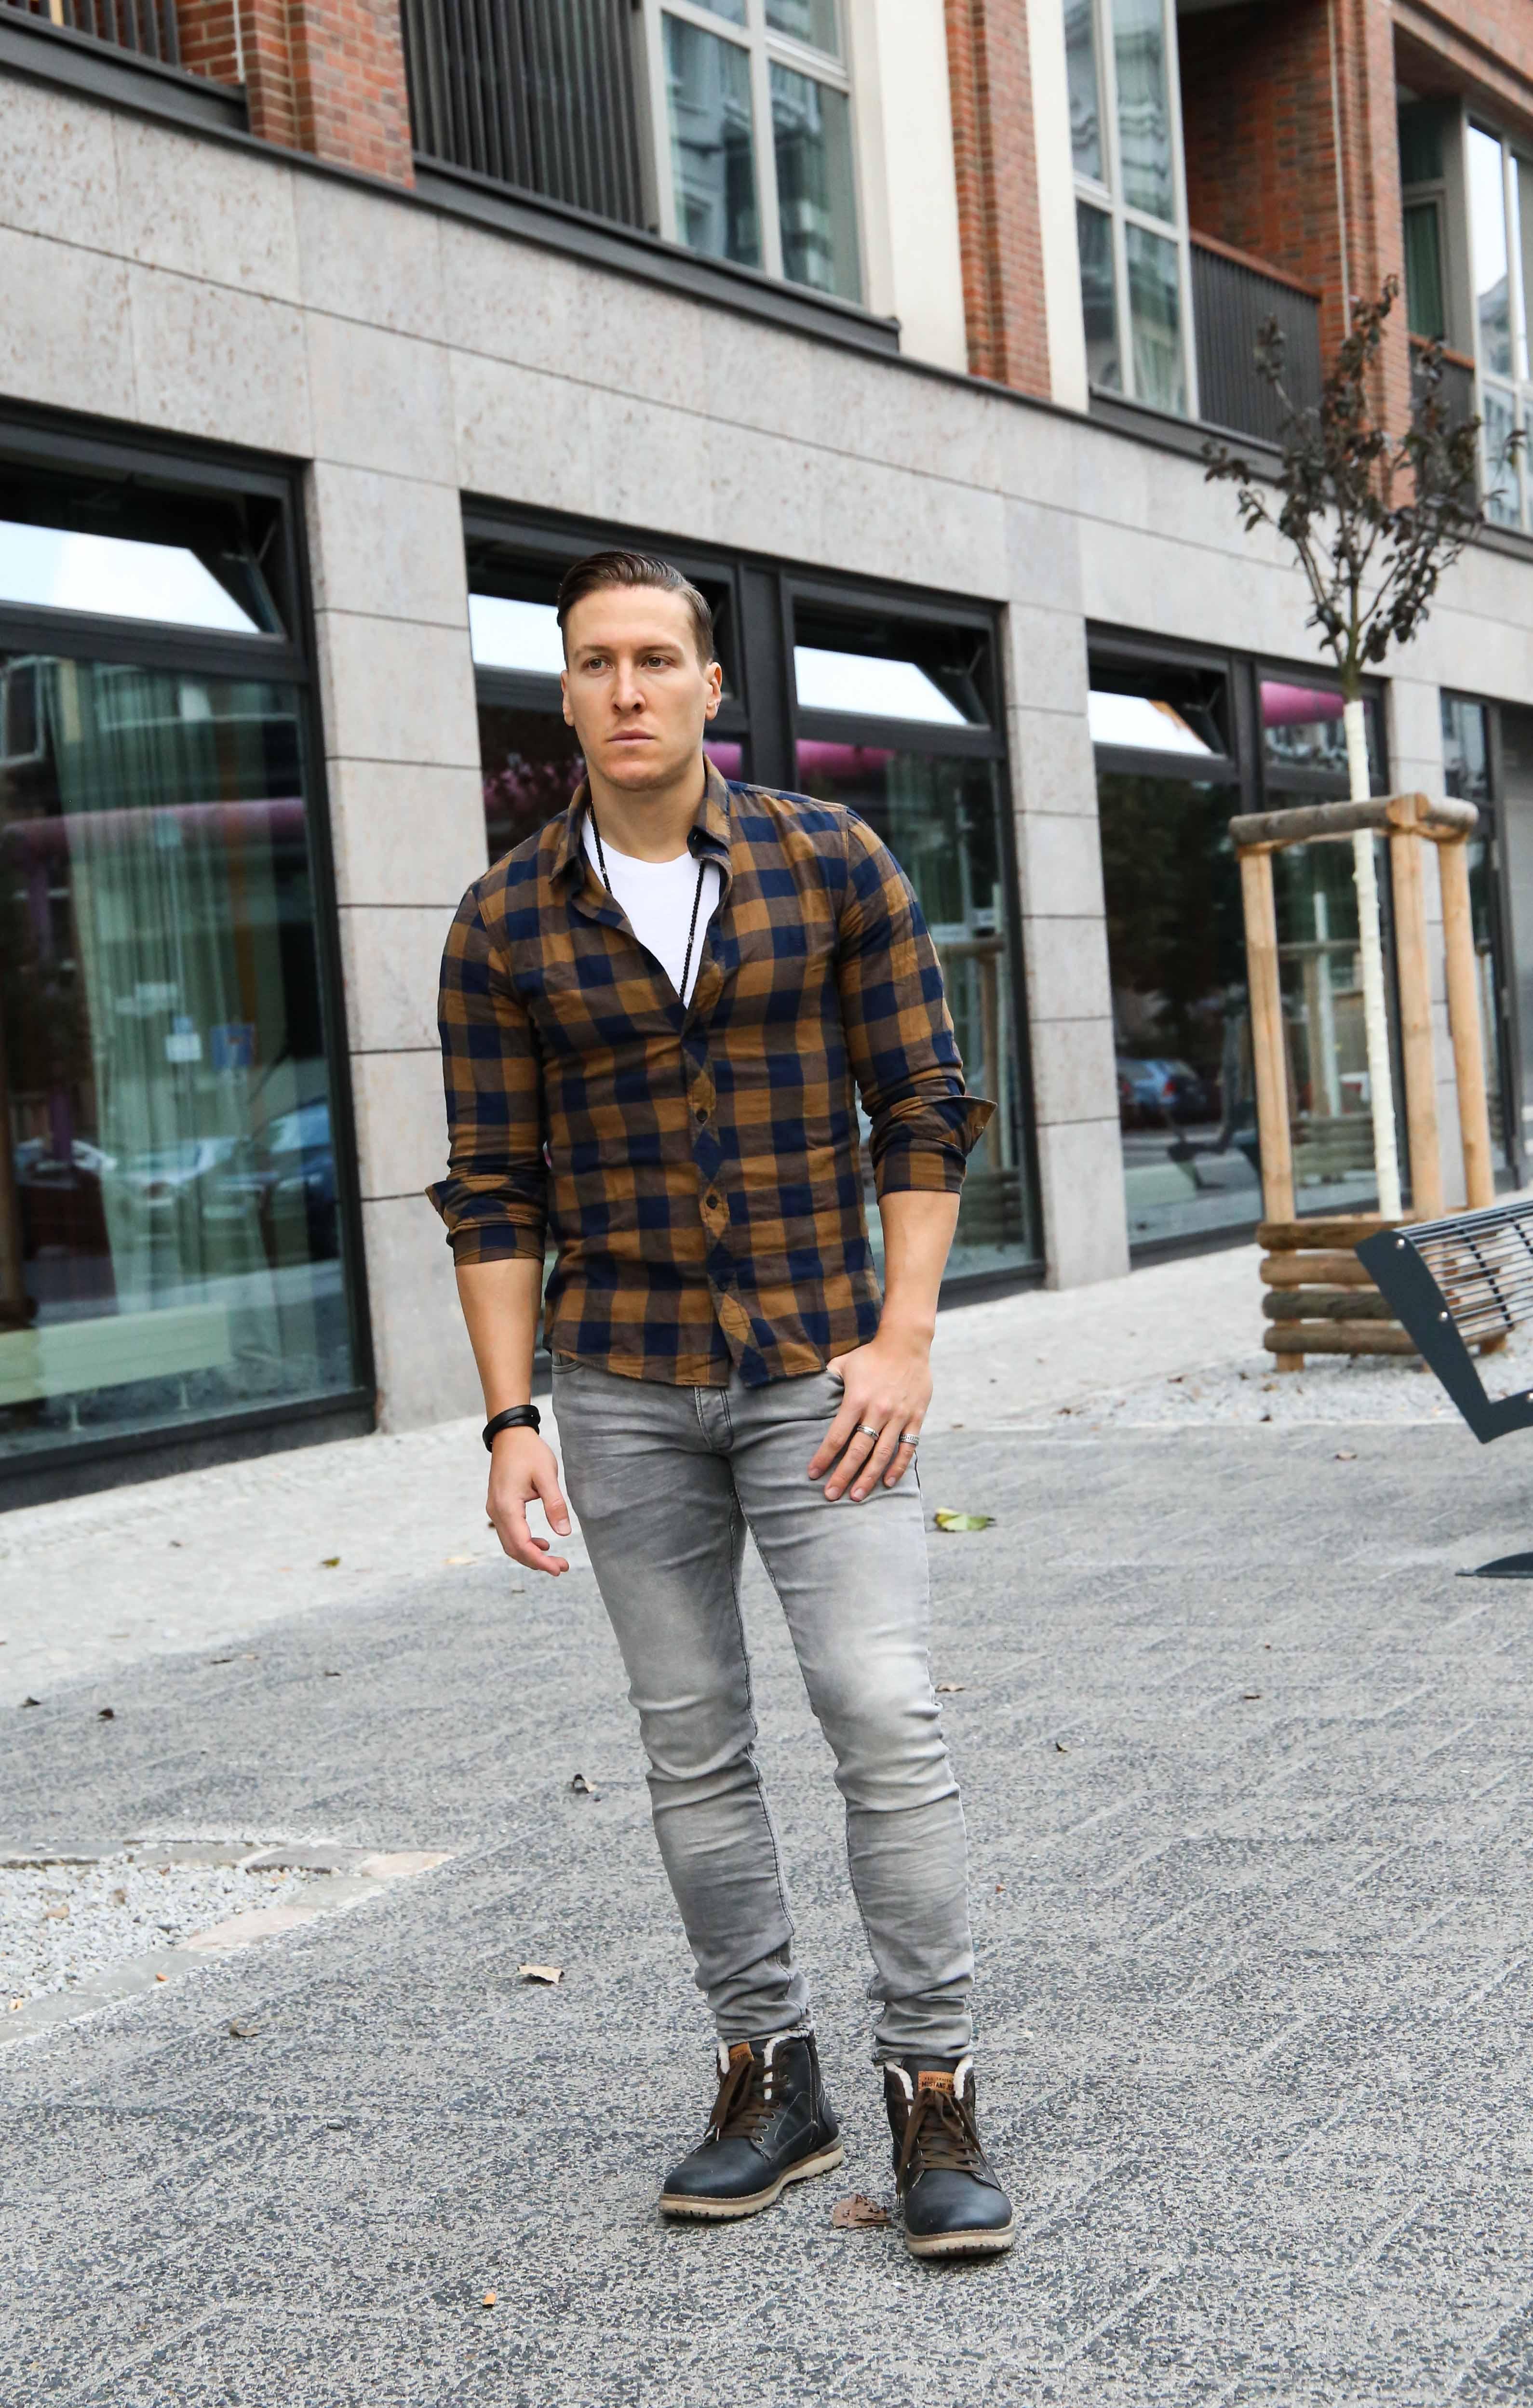 lässiger-herbstlook-graue-jeans-braunes-holzfällerhemd-modeblog-fashionblog-fashion-blogger-berlin_1513